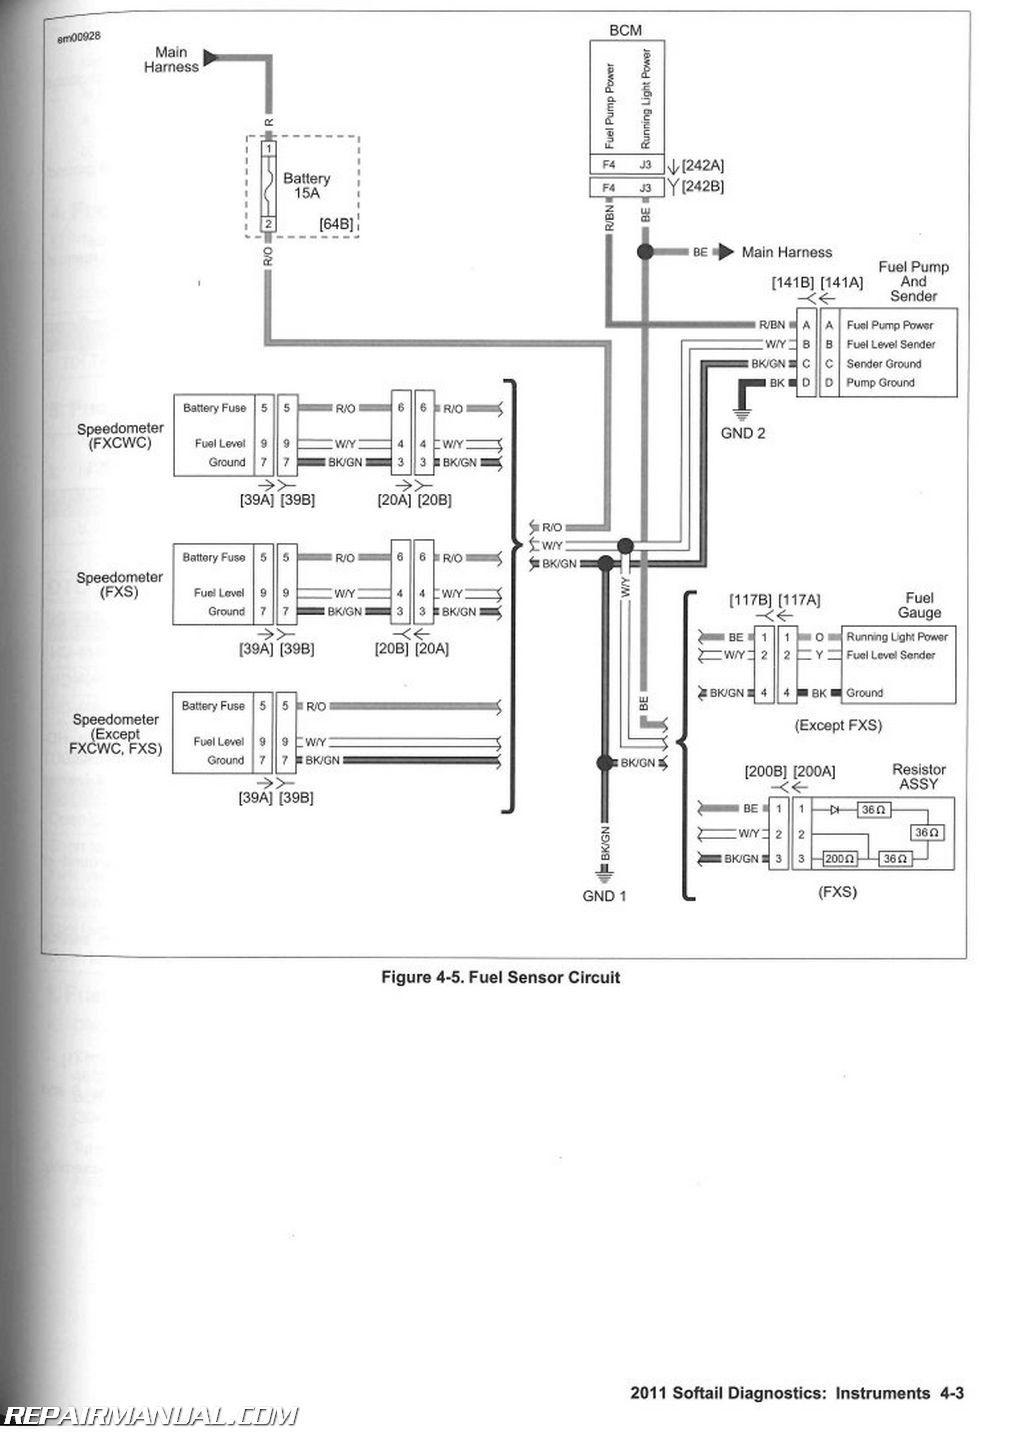 Wiring Diagram 2008 Harley Davidson Rocker - WIRE Center • on simple harley wiring diagram, harley wiring diagrams online, 2001 sportster ignition system diagram, harley wiring diagram for dummies, harley touring wiring diagram, honda motorcycle wire diagram, ktm exc wiring diagram, ktm 450 wiring diagram, tomos wiring diagram, harley speedometer wiring, 2000 harley wiring diagram, rupp snowmobile wiring diagram, marine boat wiring diagram, harley sportster wiring diagram, husaberg wiring diagram, harley bar and shield dxf, cf moto wiring diagram, nissan wiring diagram, harley softail wiring diagram, 2003 harley wiring diagram,